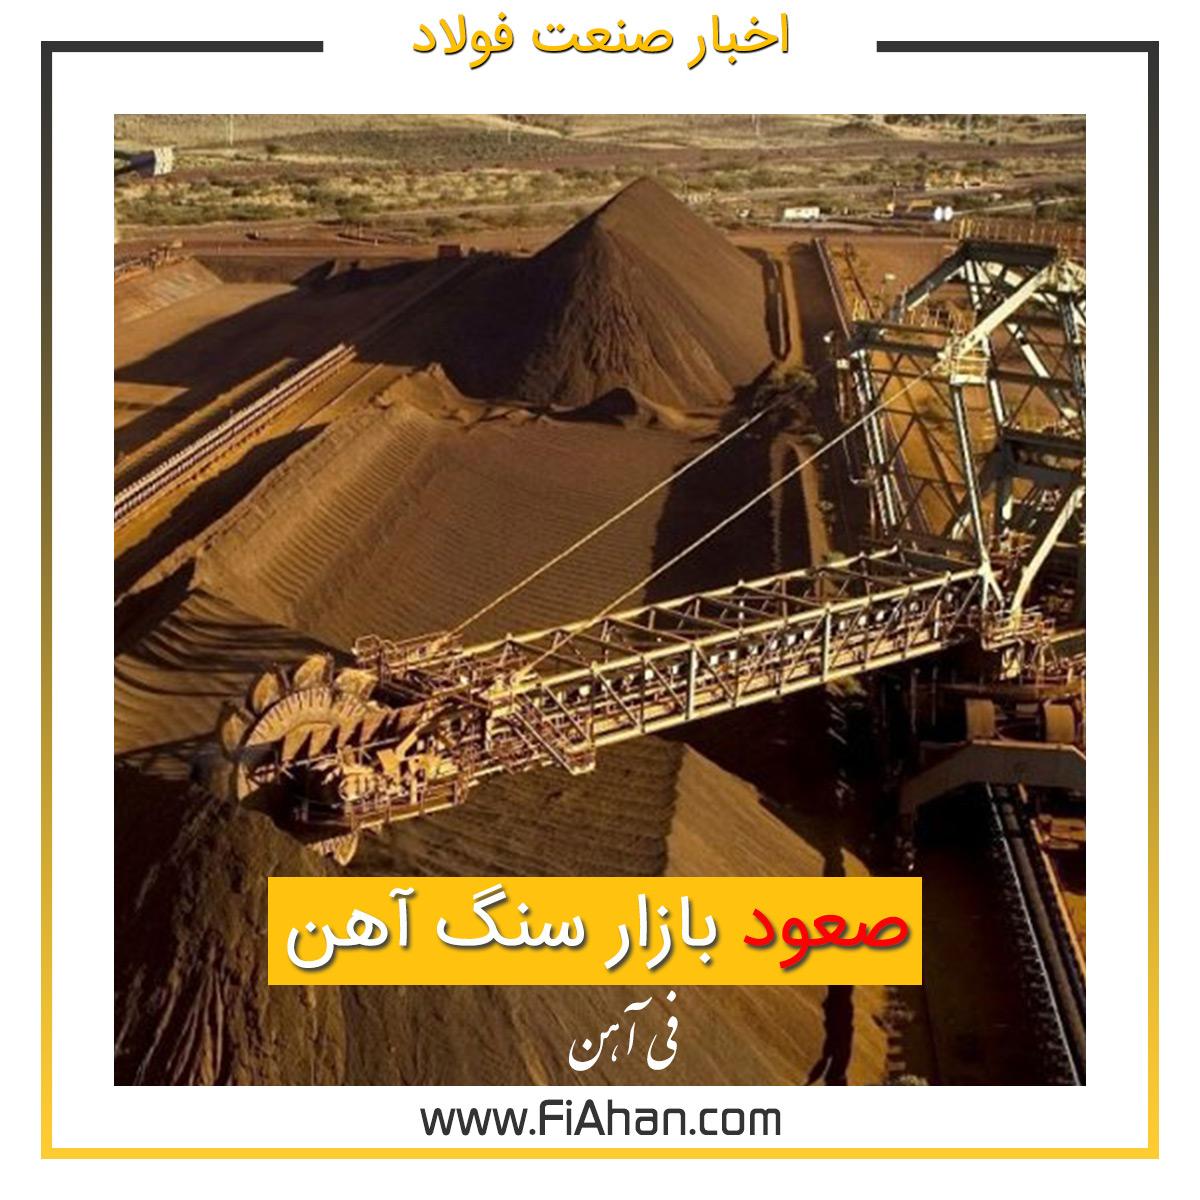 صعود-قیمت-سنگ-آهن